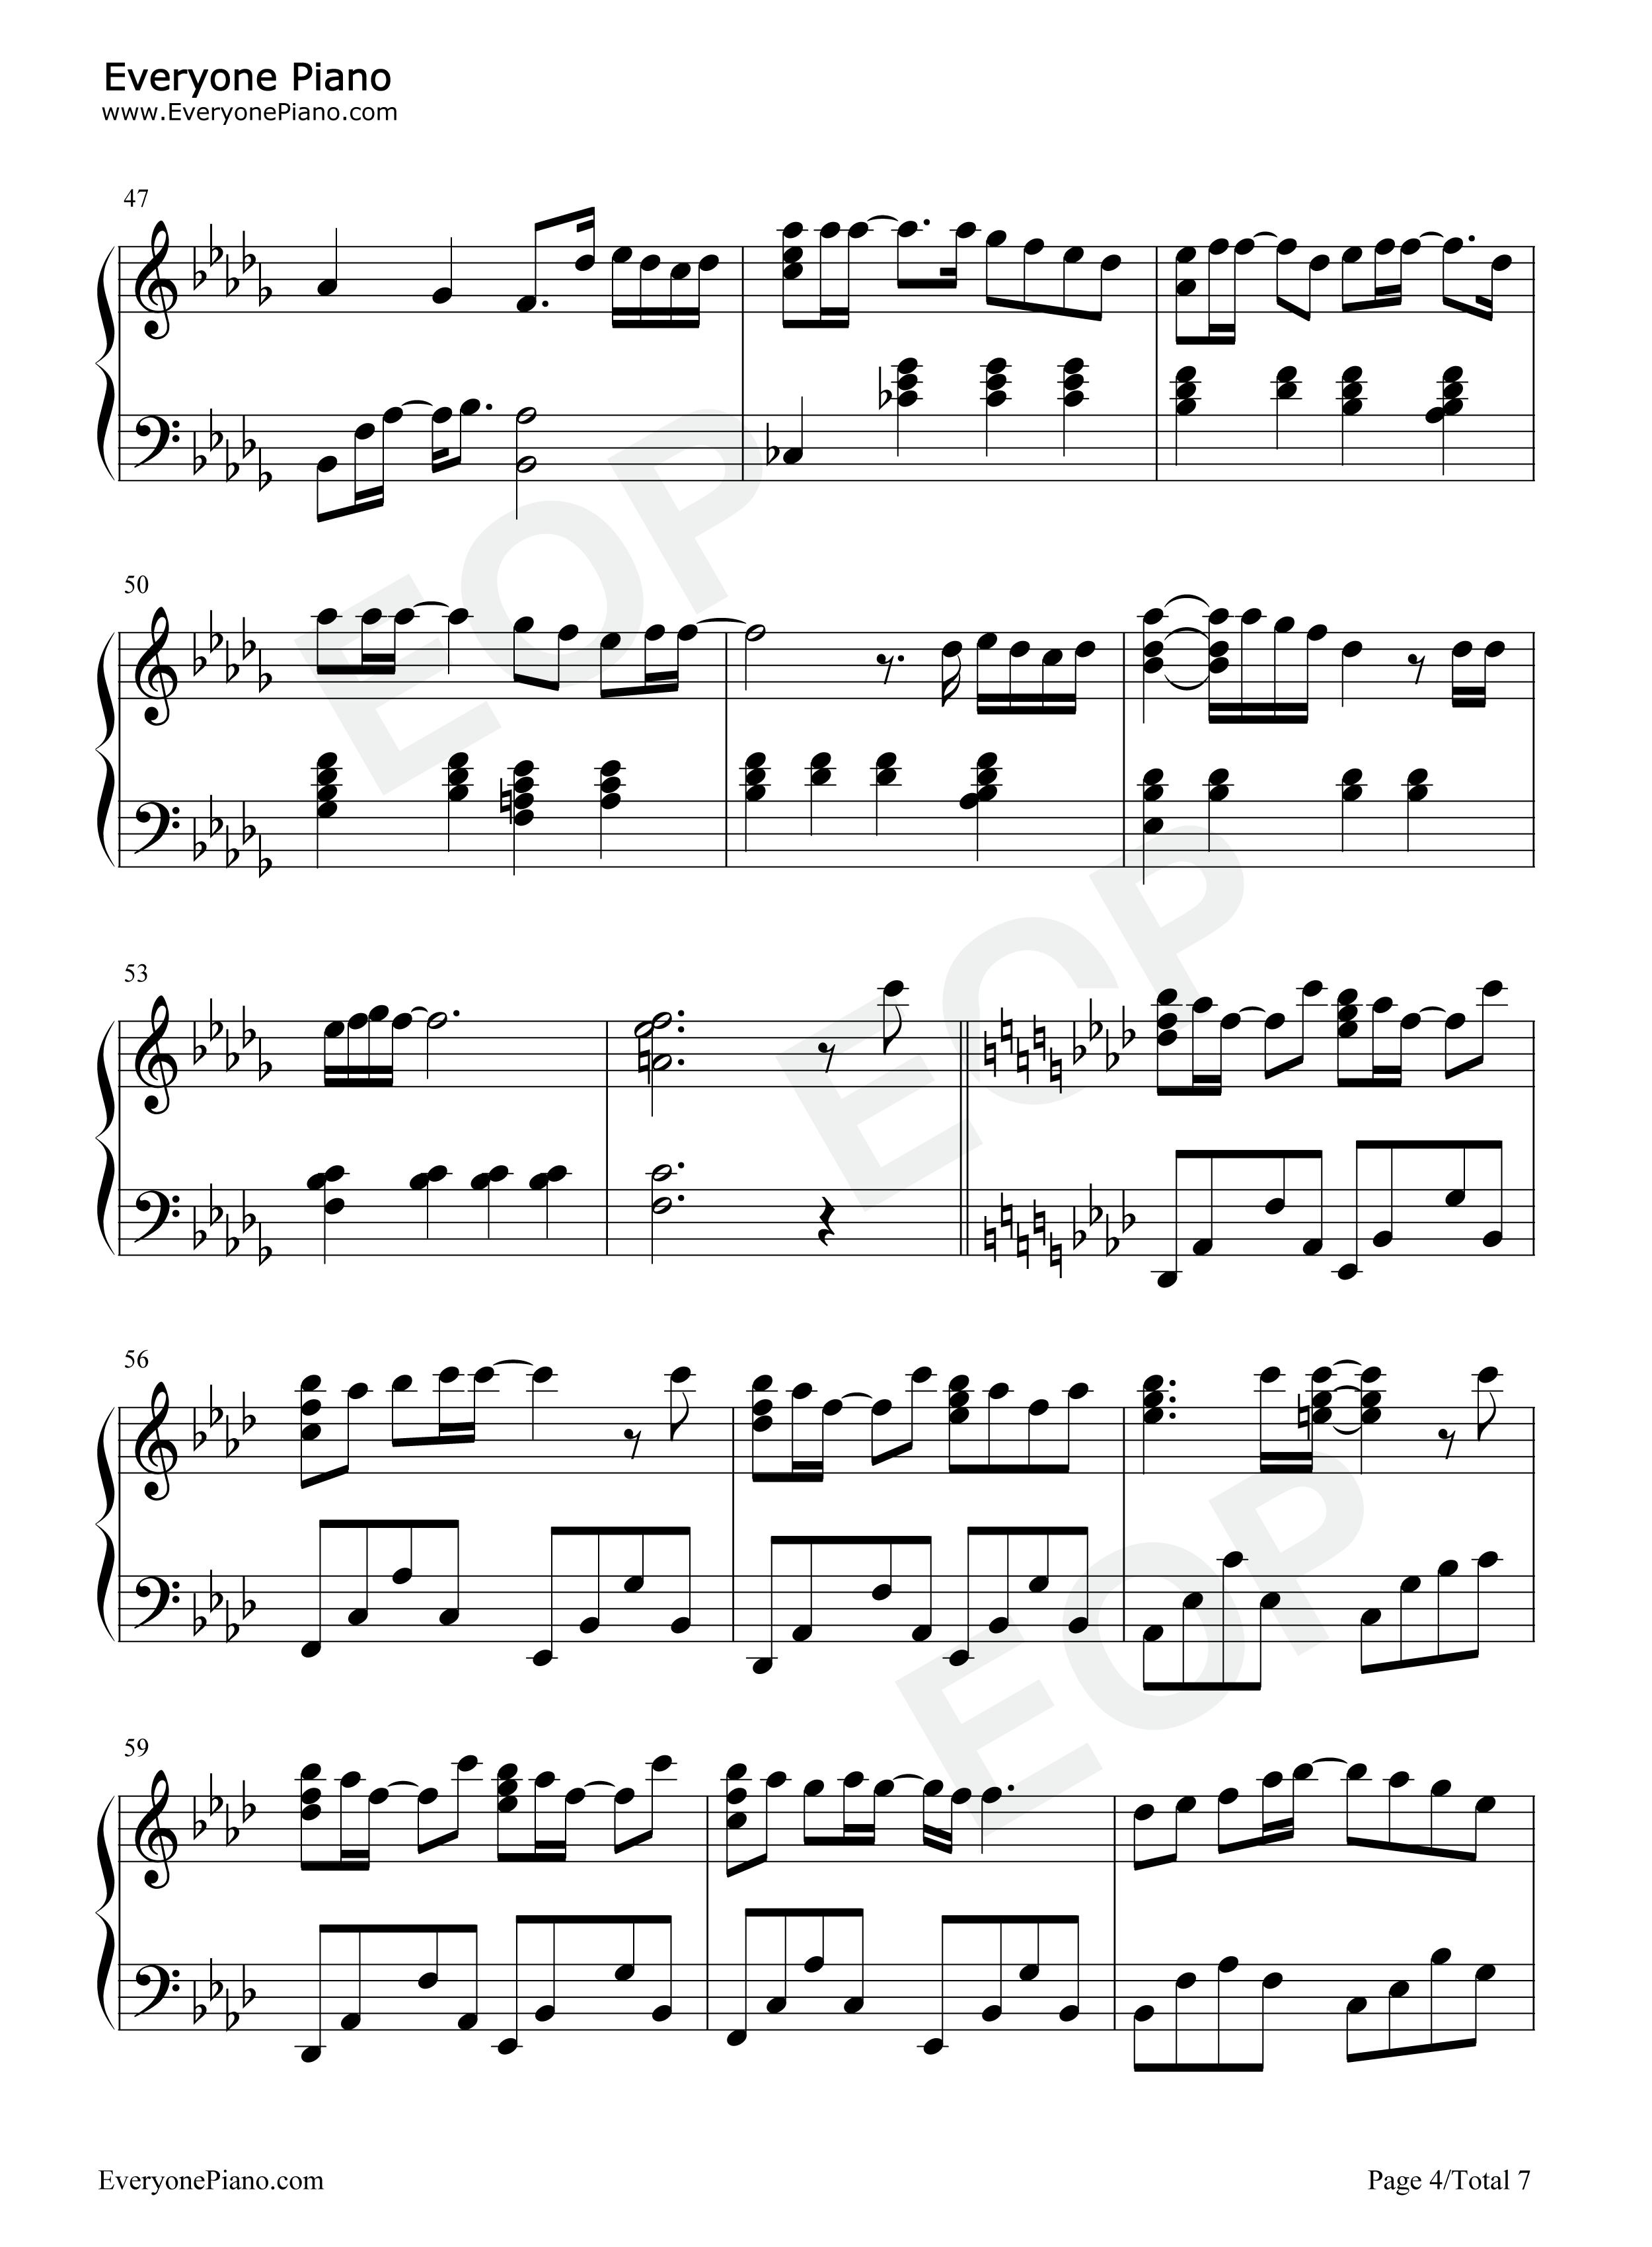 Where can i find Piano music sheets of Ayumi Hamasaki's songs?